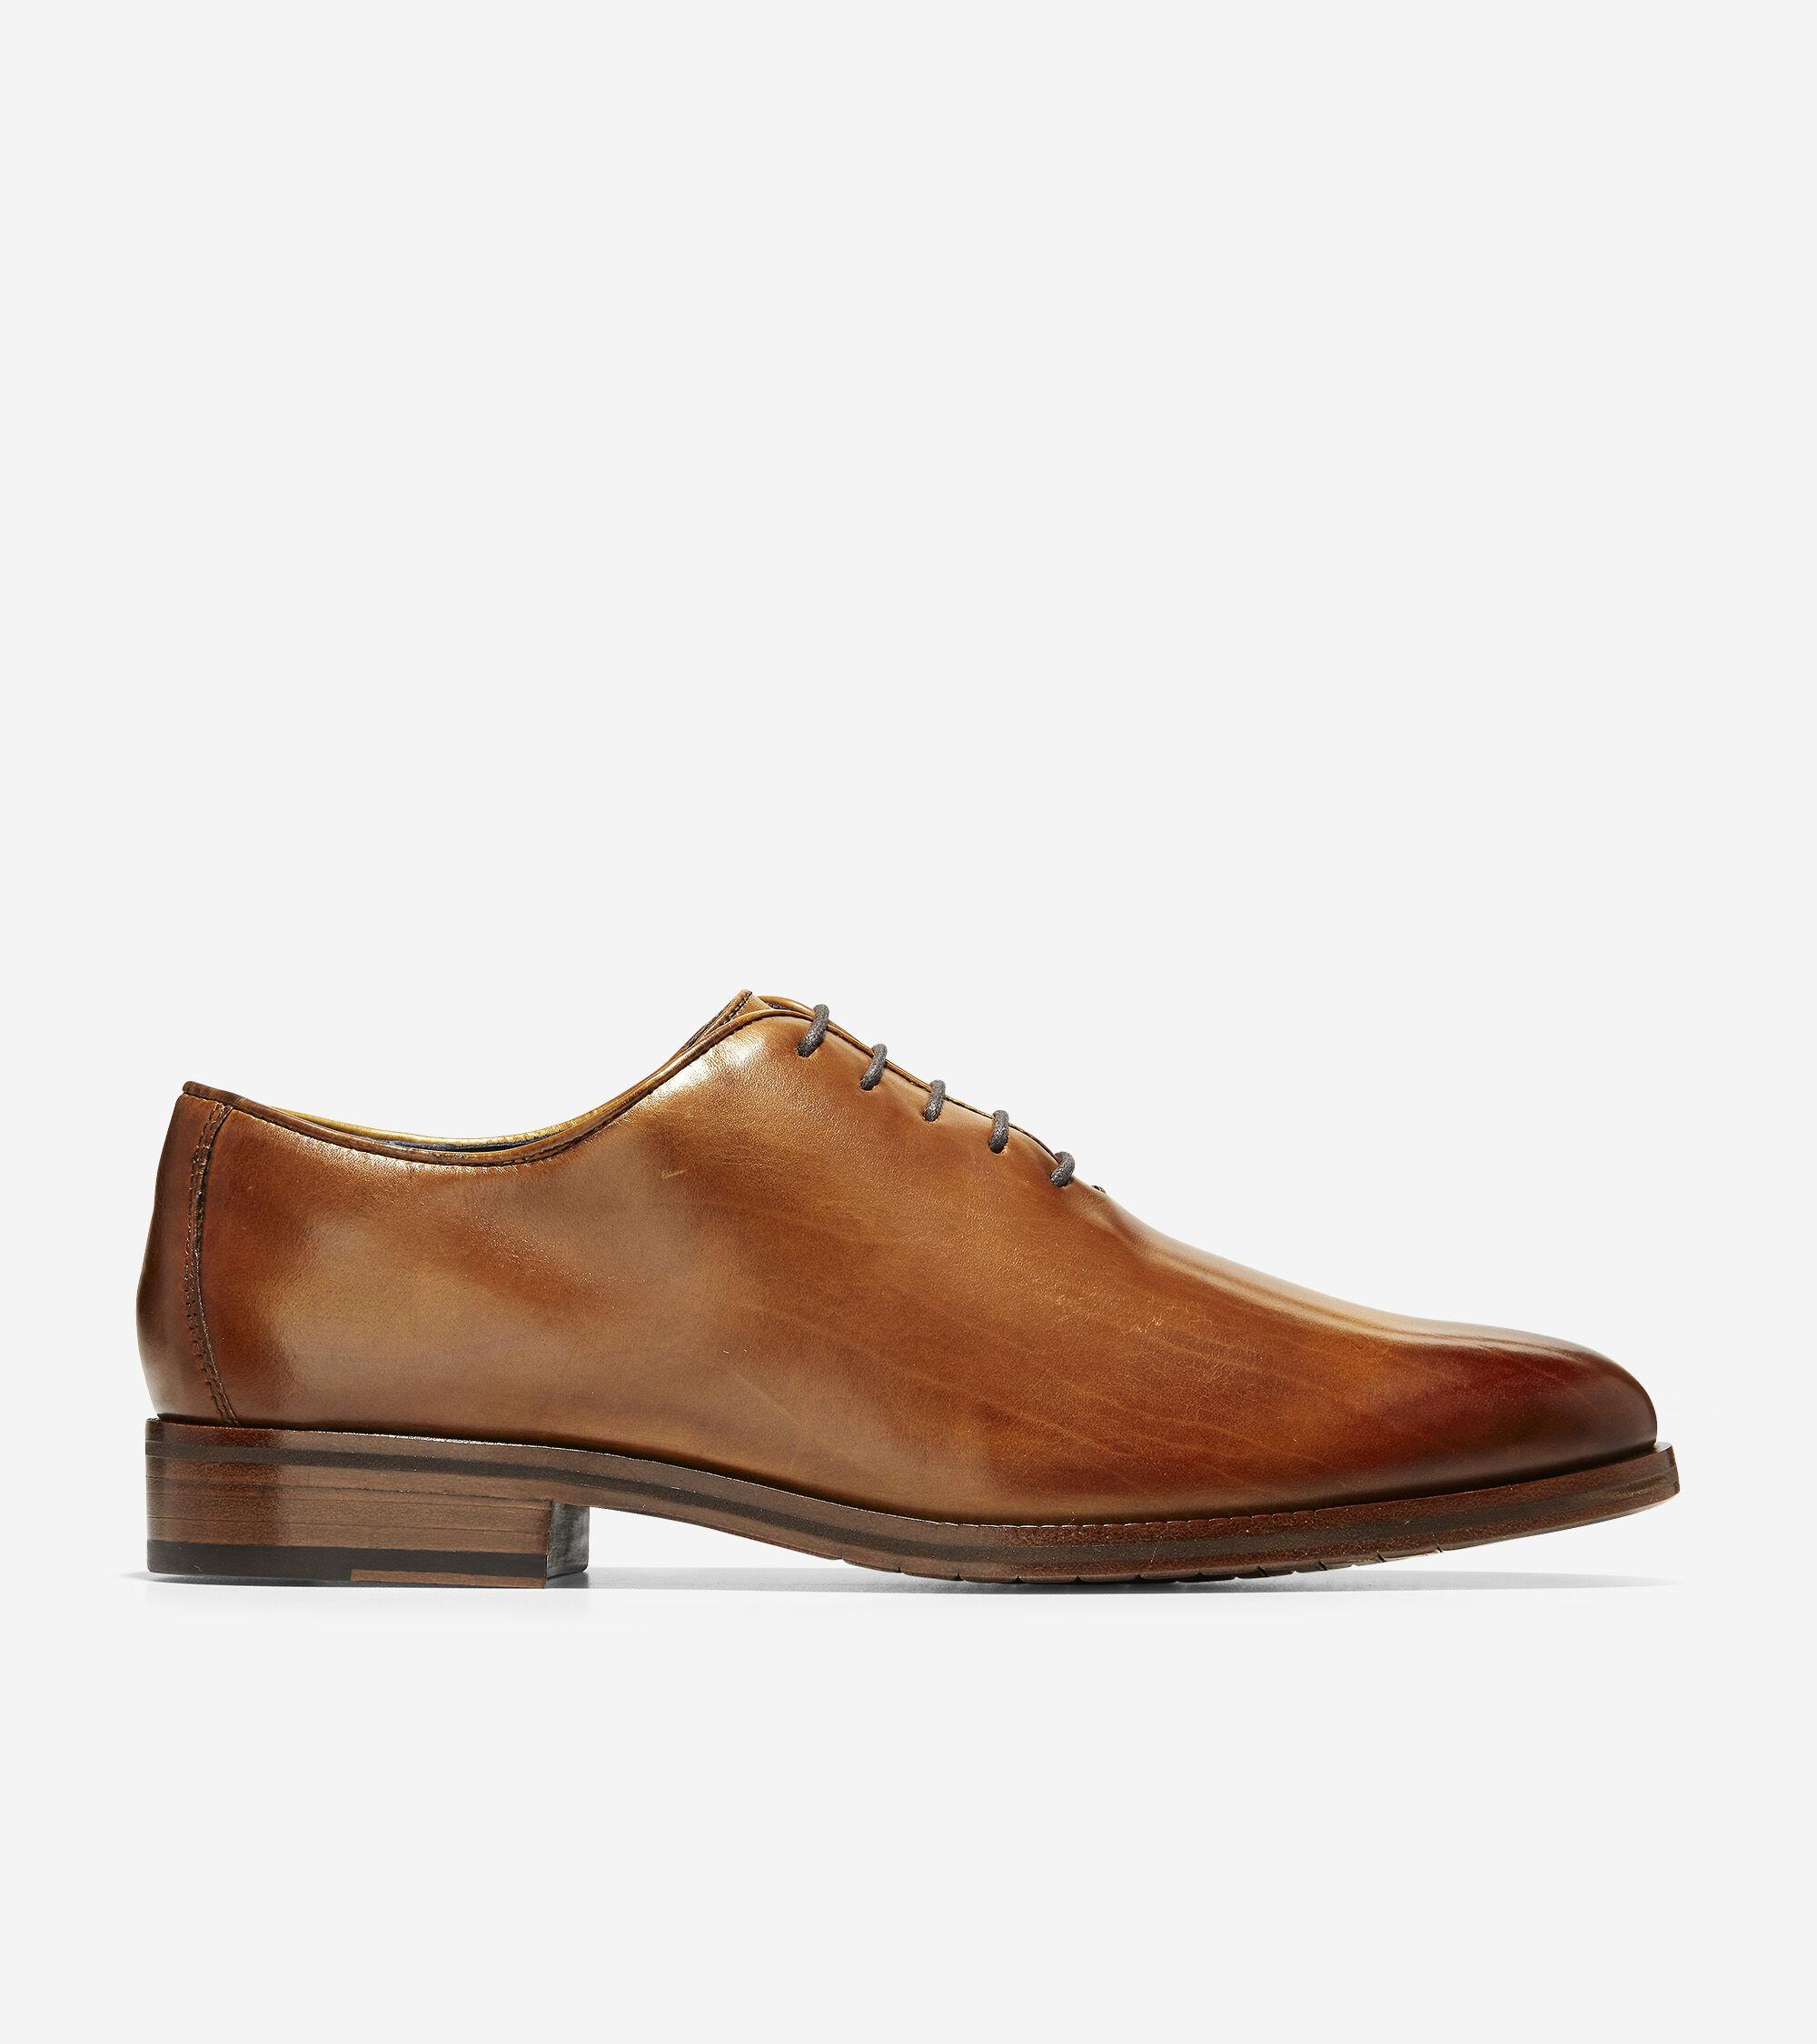 Cole Haan Washington Grand Wholecut Oxford Shoes